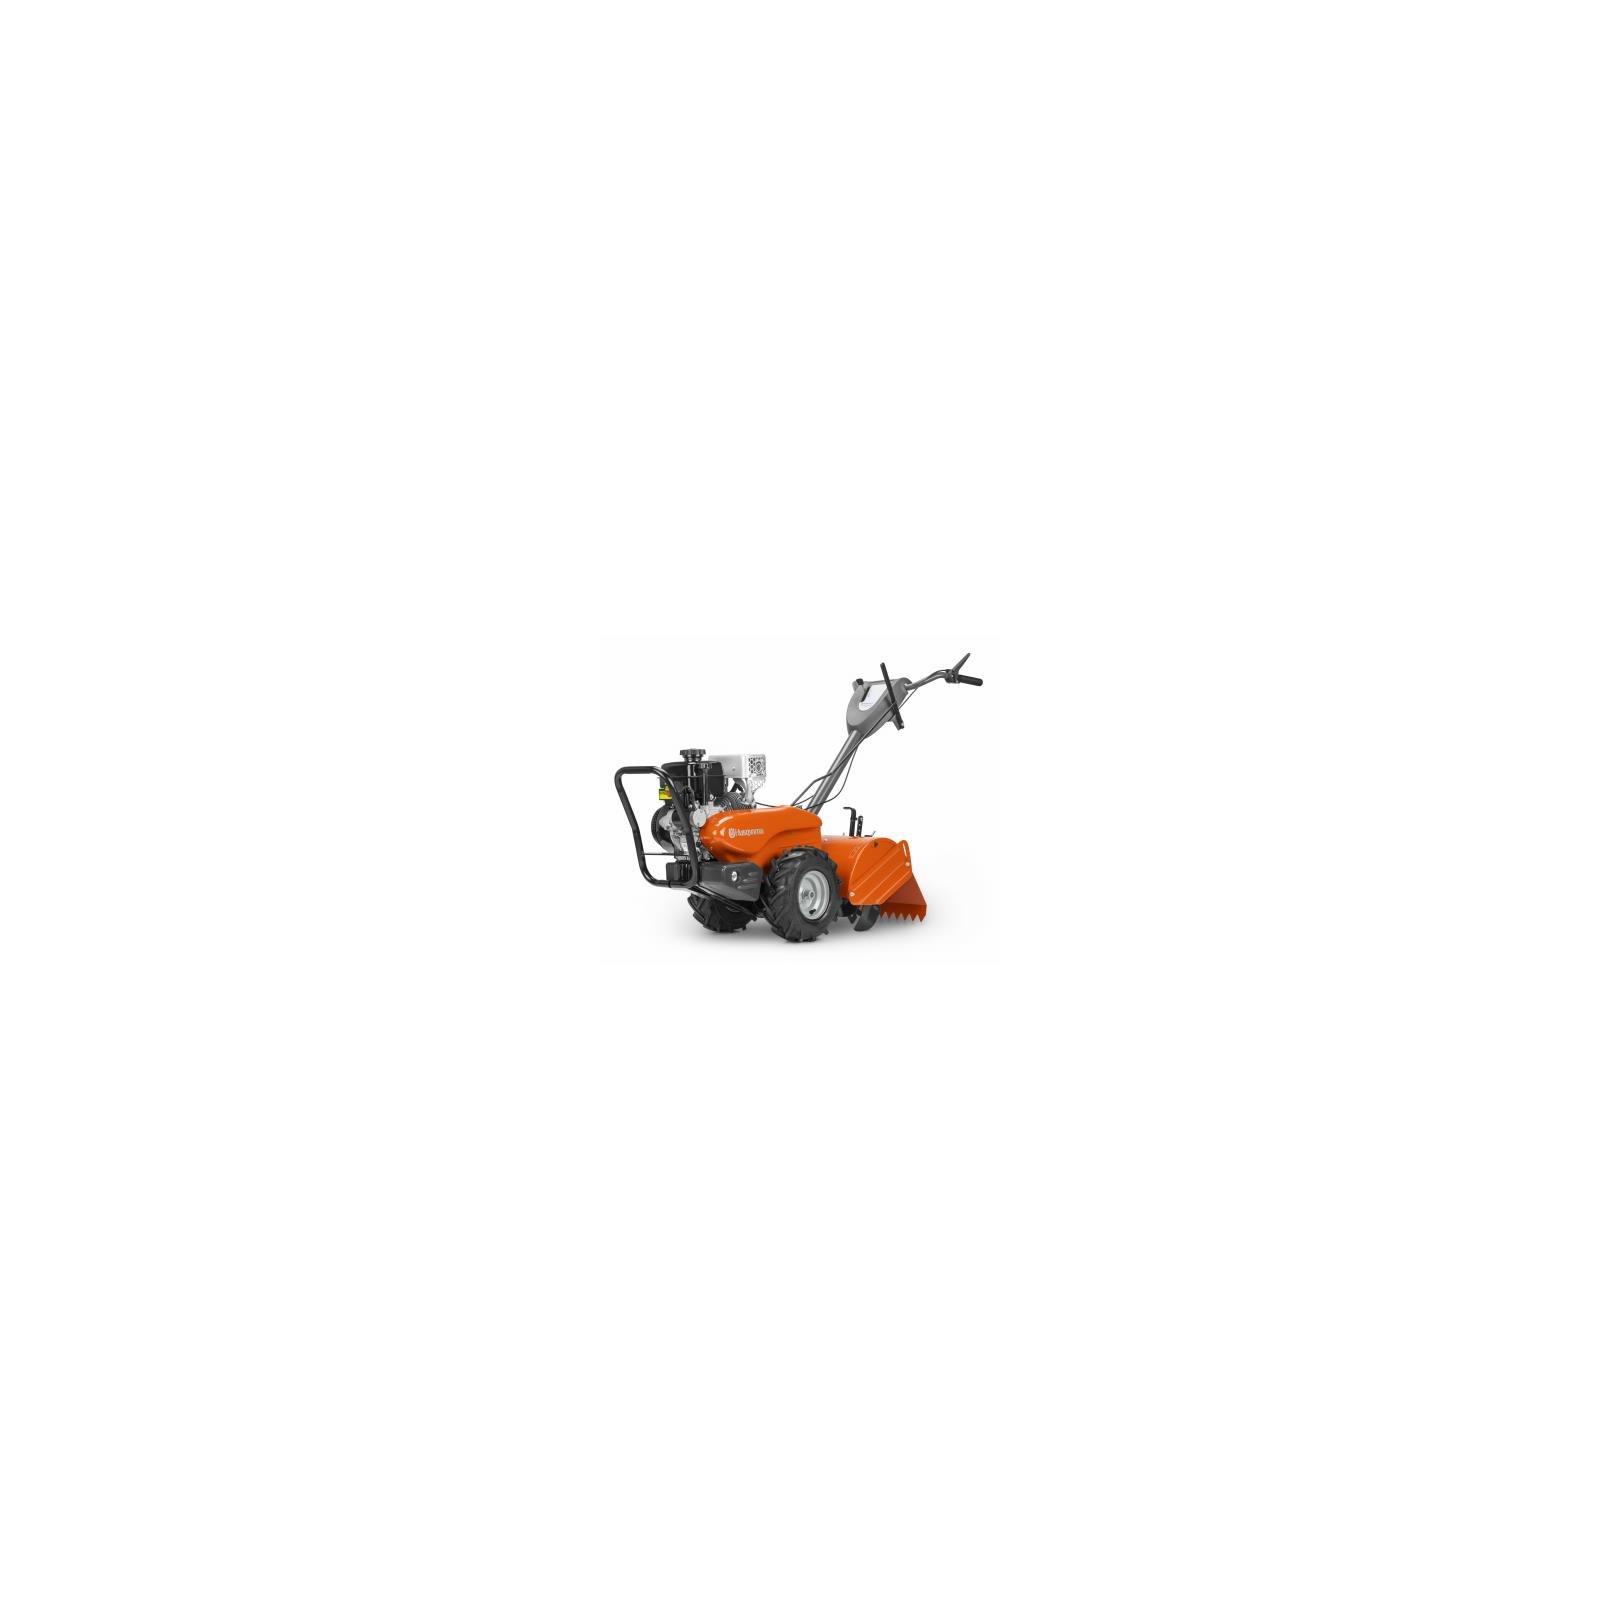 Husqvarna Outdoor Products TR317DE 960930031 Rear-Tine Tiller, Gas, 208cc Engine, 17-In. - Quantity 1